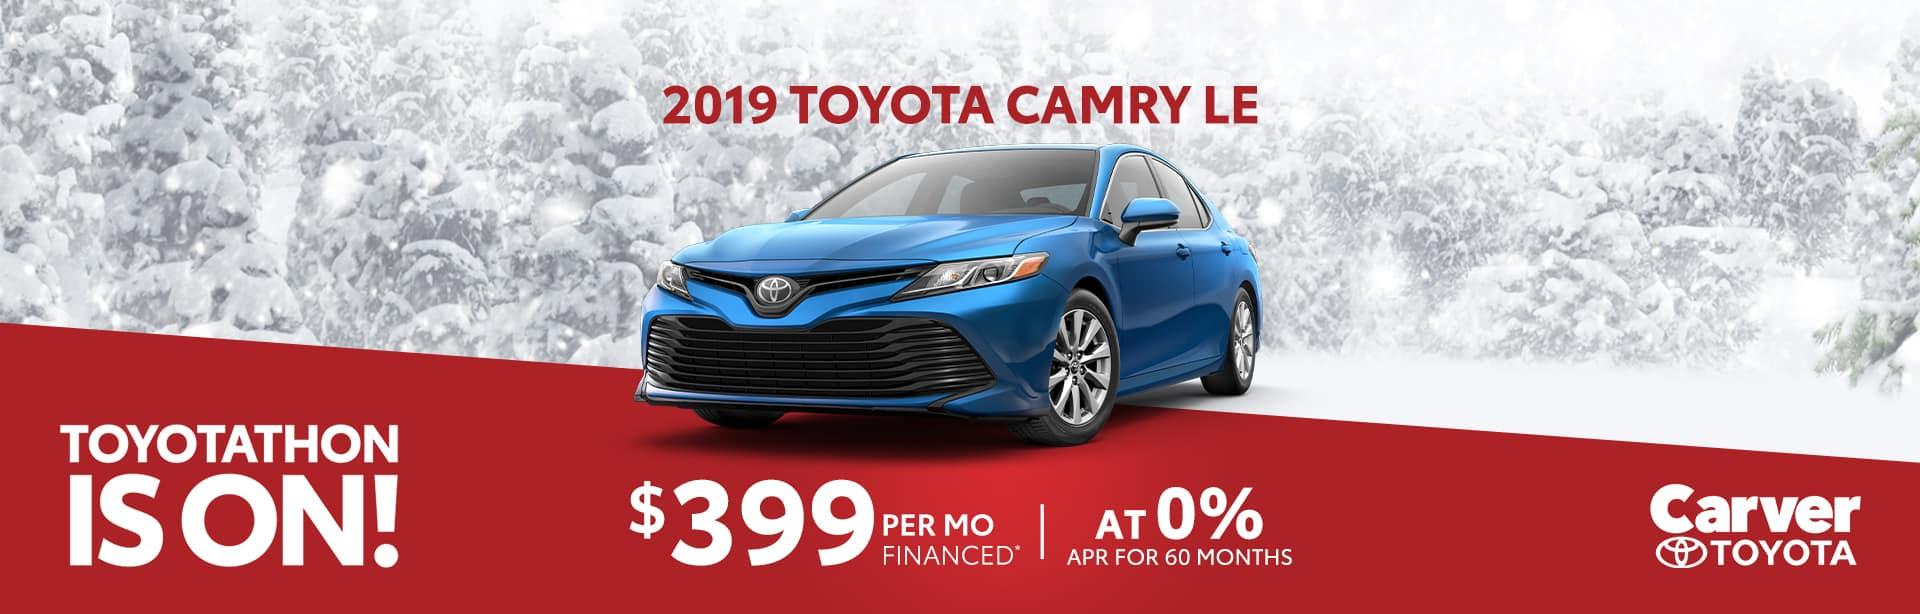 Finance a 2019 Camry at 0% near Shelbyville, Indiana